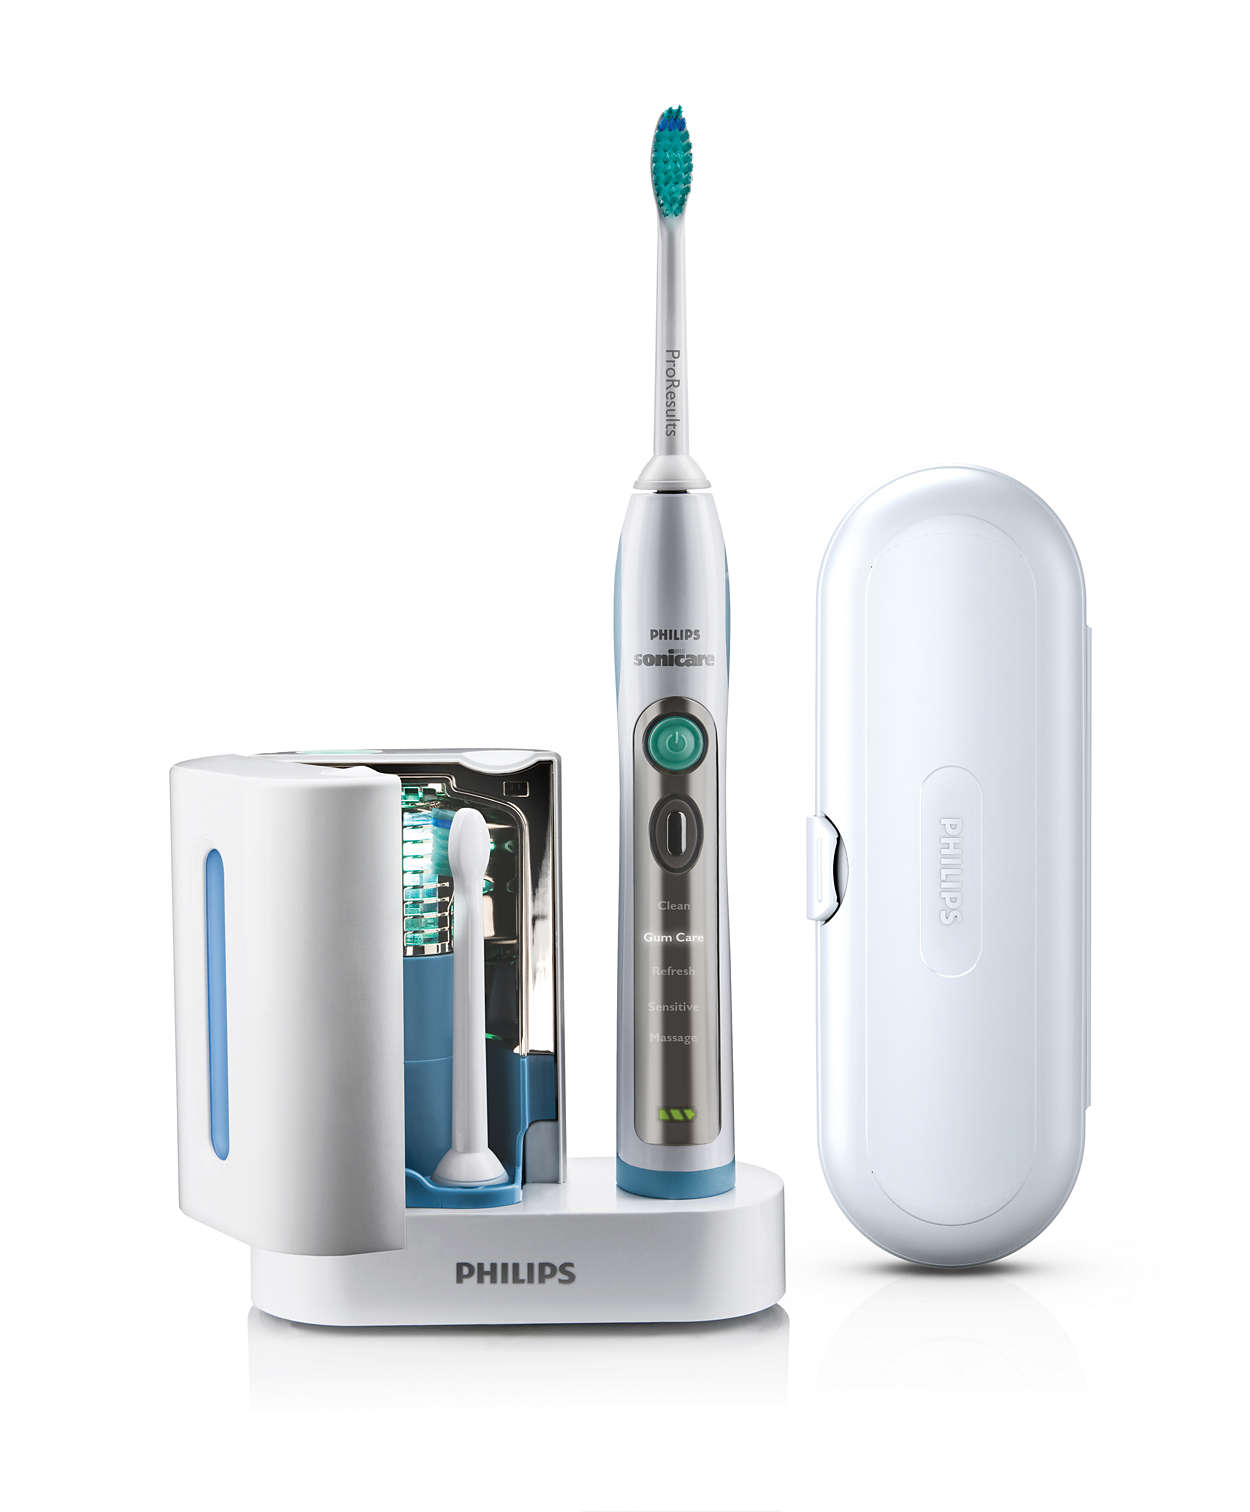 Visapusė dantenų priežiūra